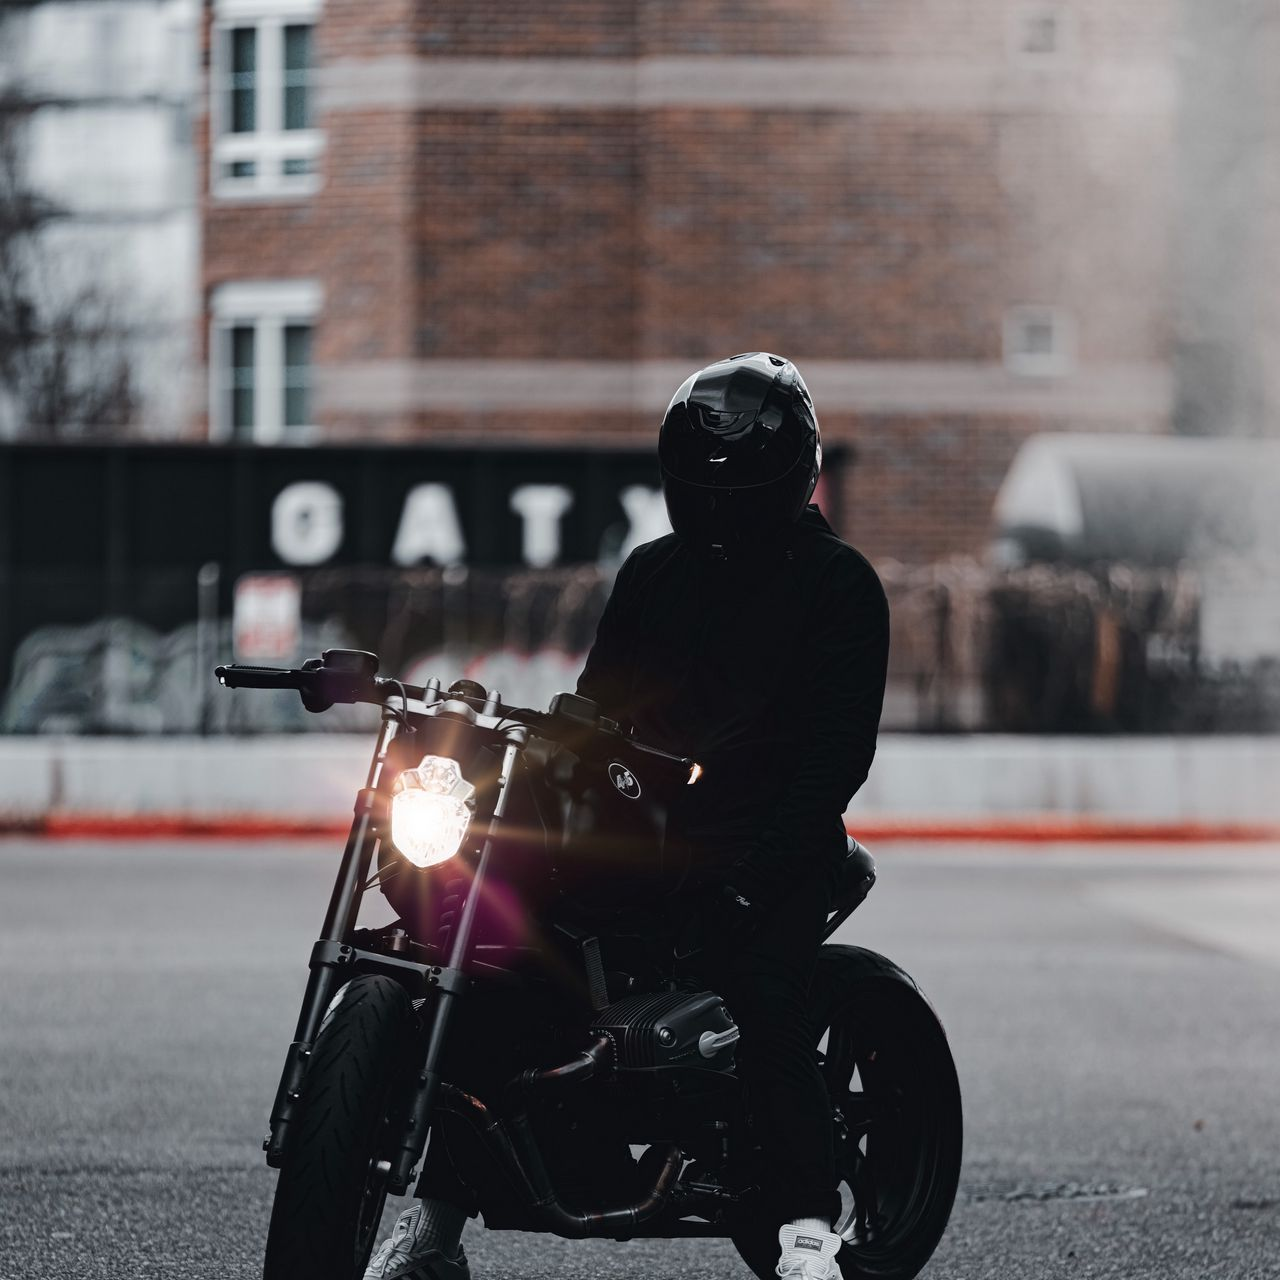 1280x1280 Обои мотоцикл, байк, мотоциклист, черный, свет, дорога